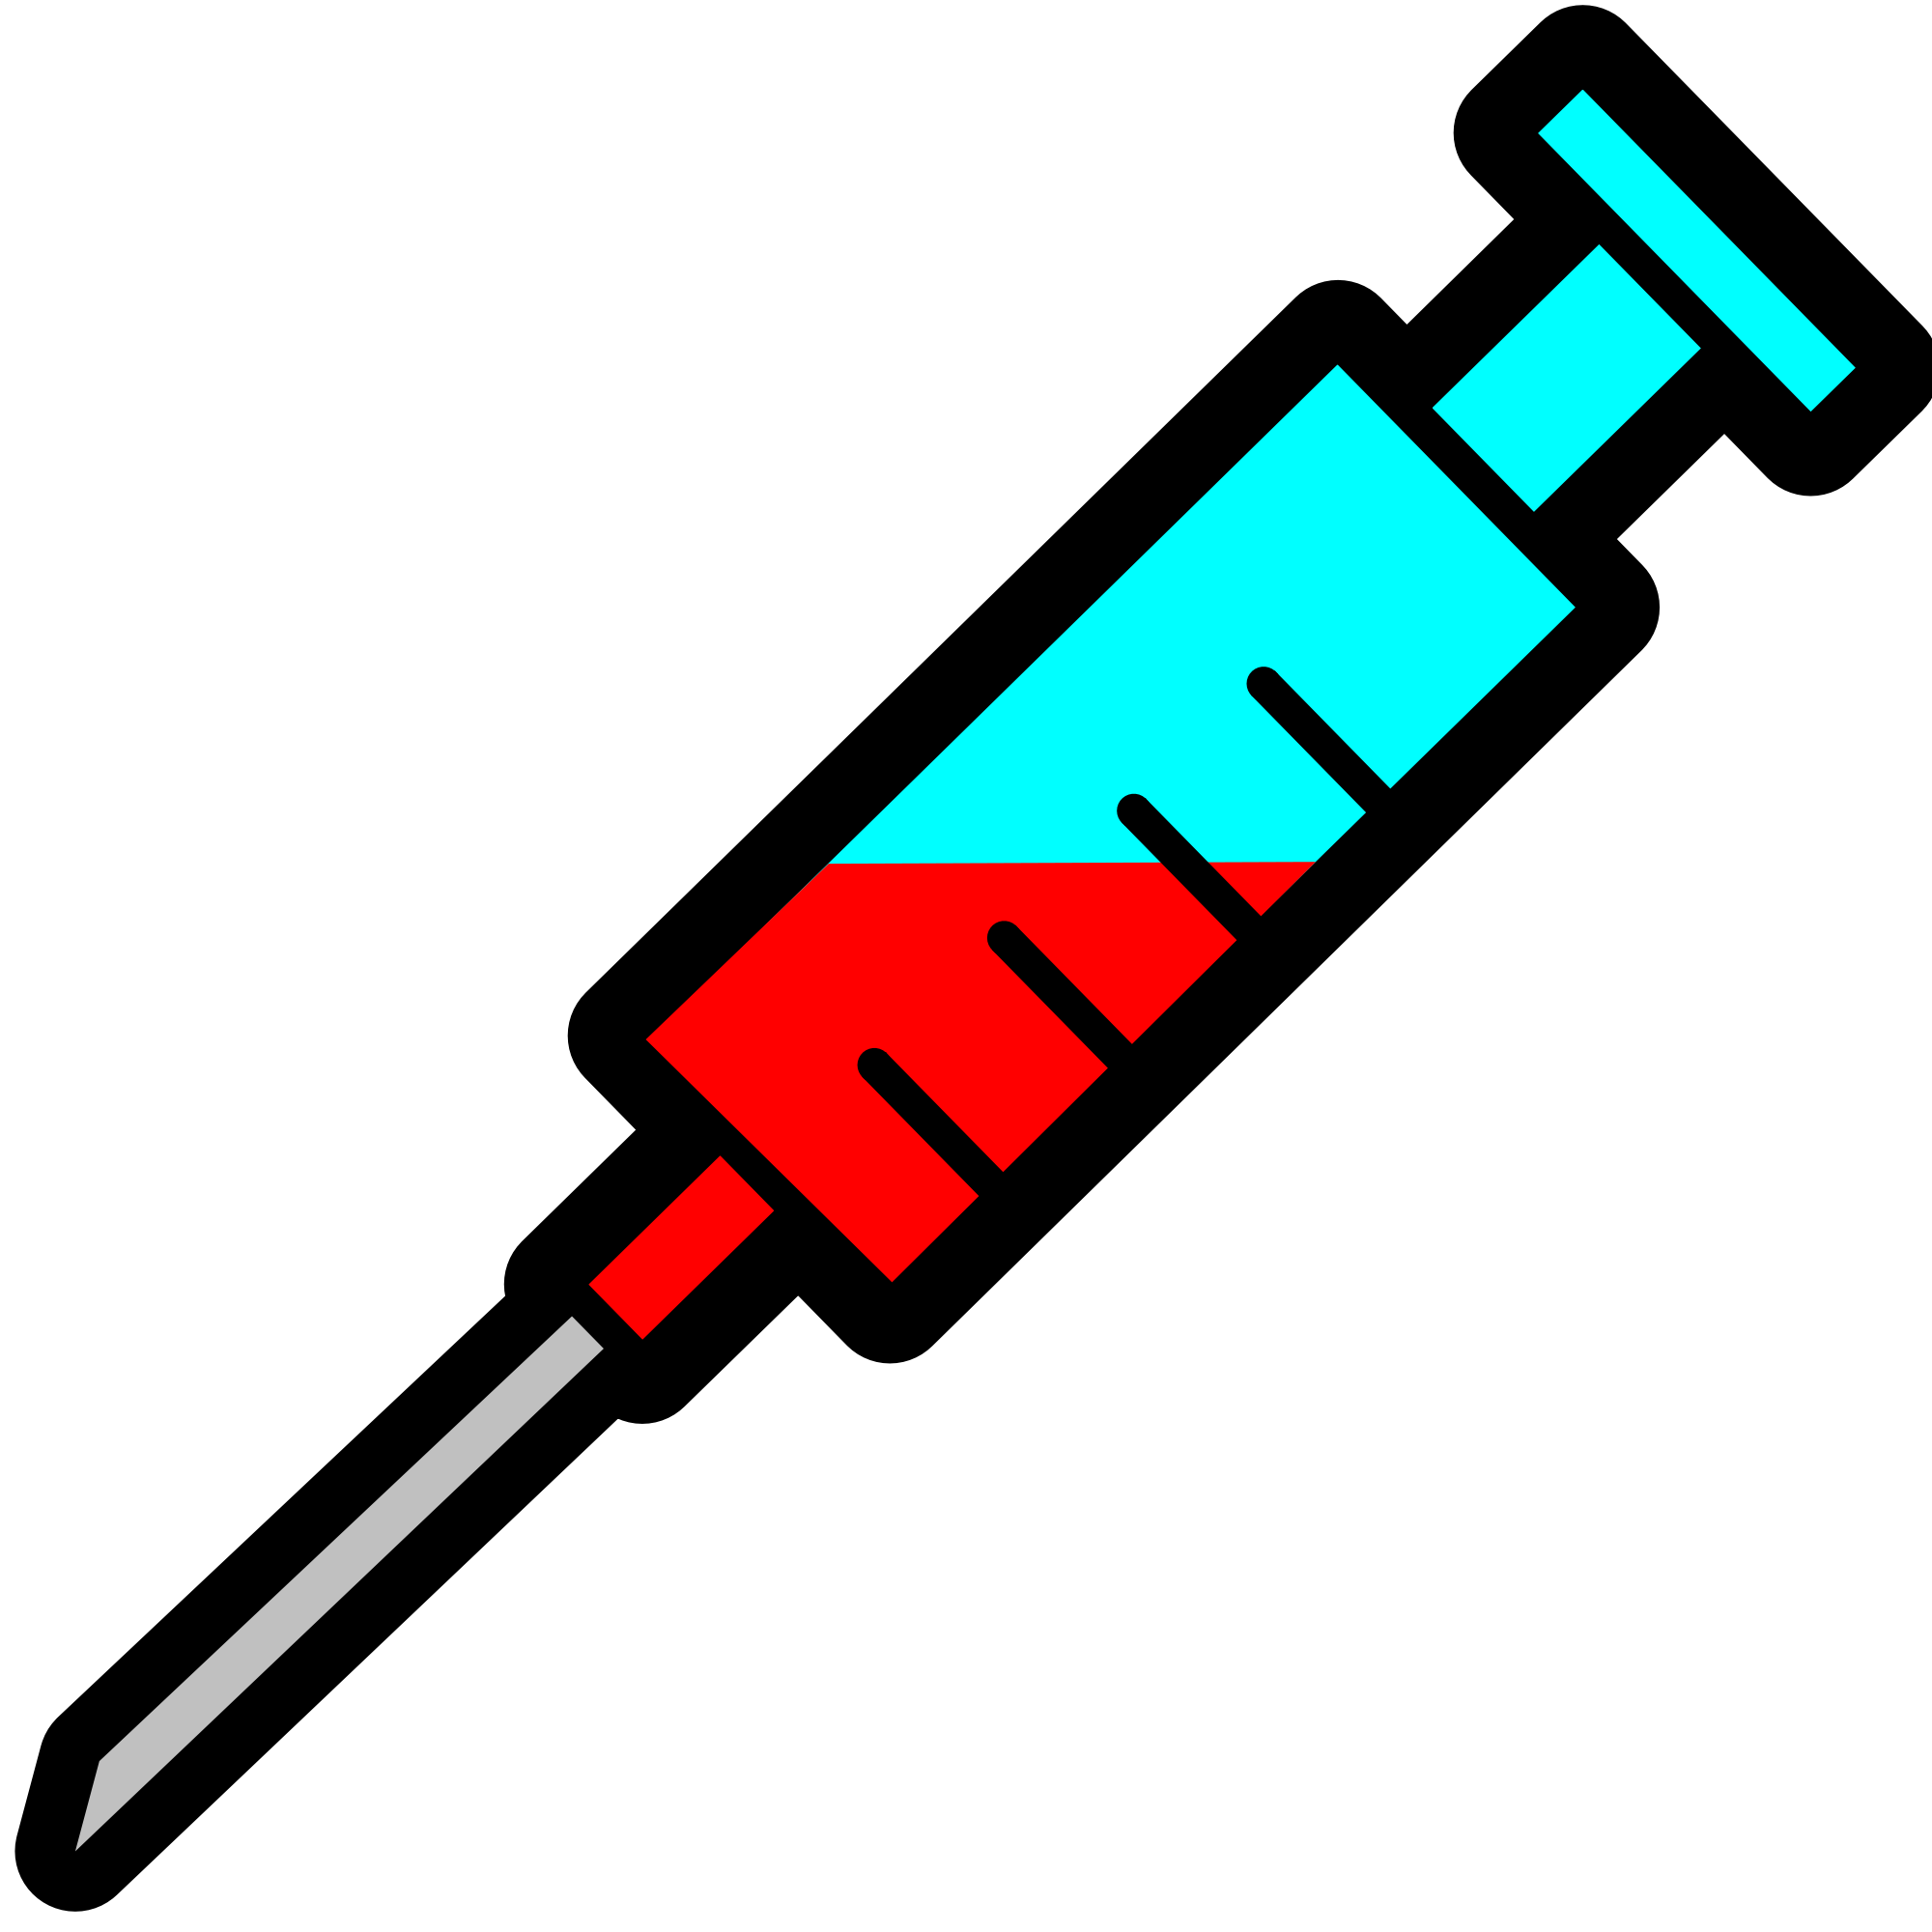 syringe clipart svg